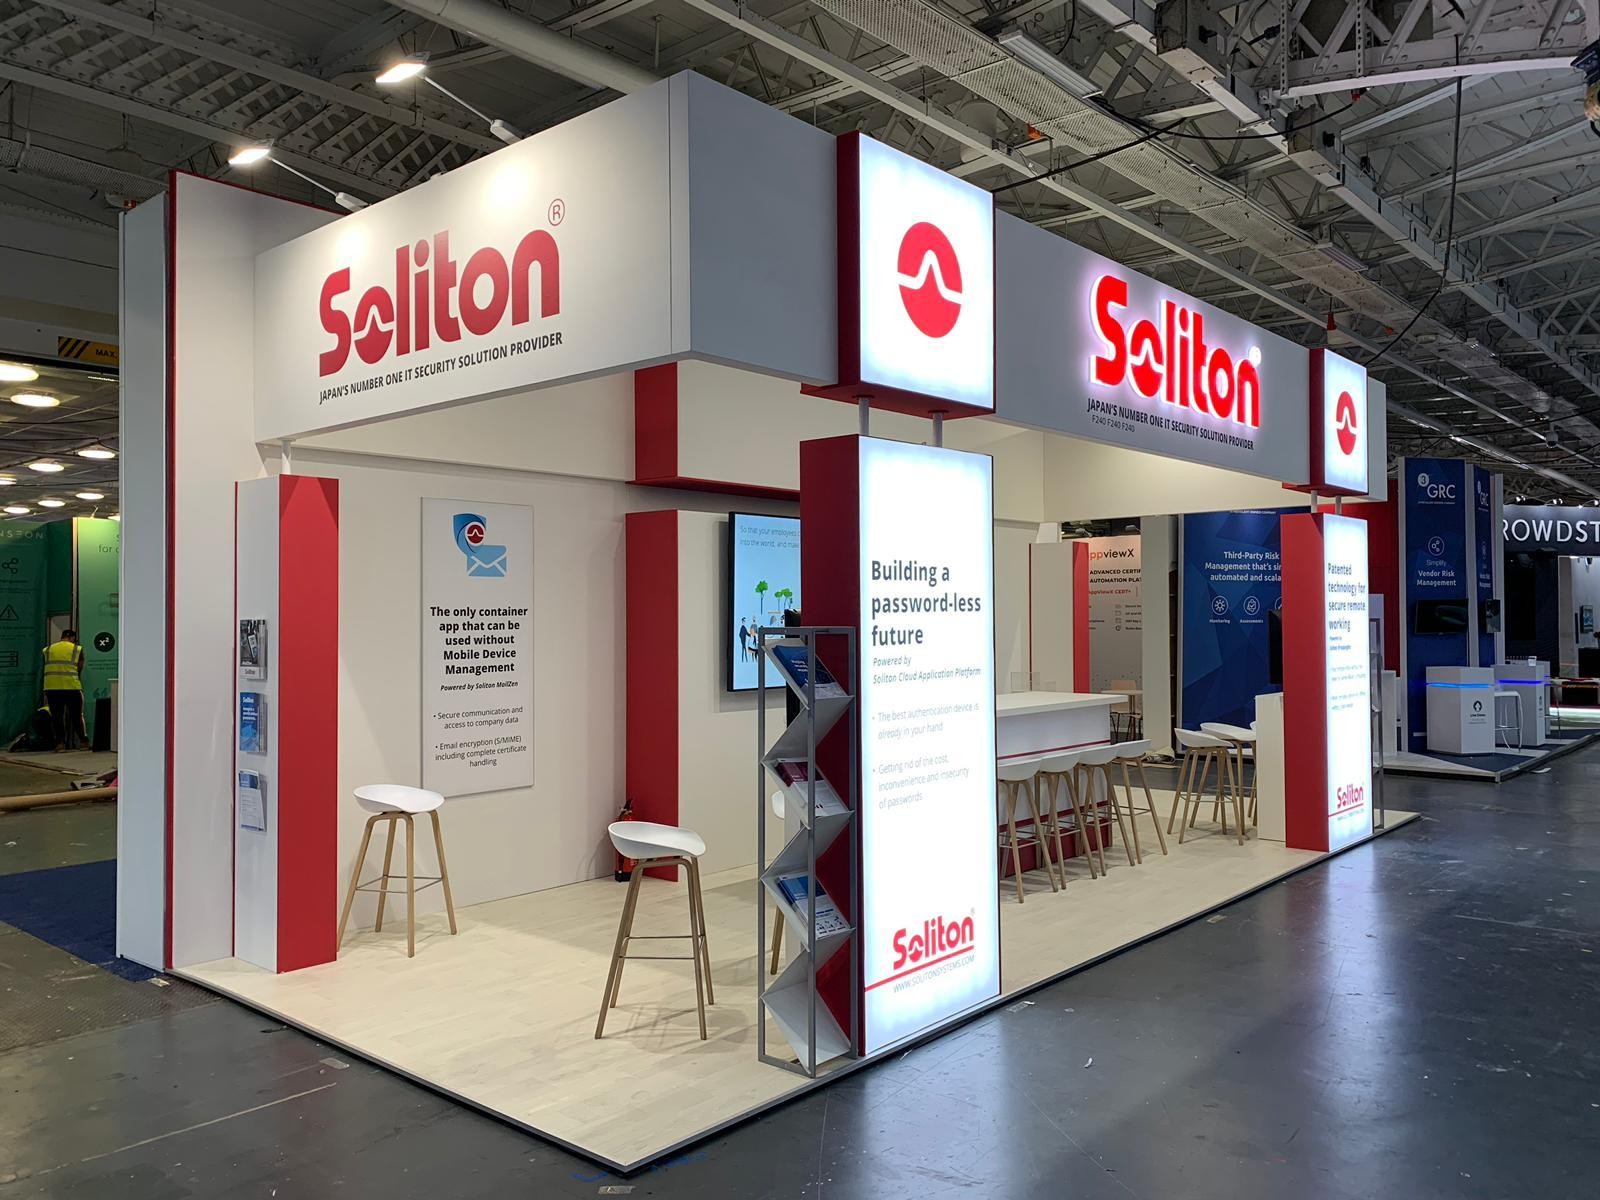 Soliton Systems